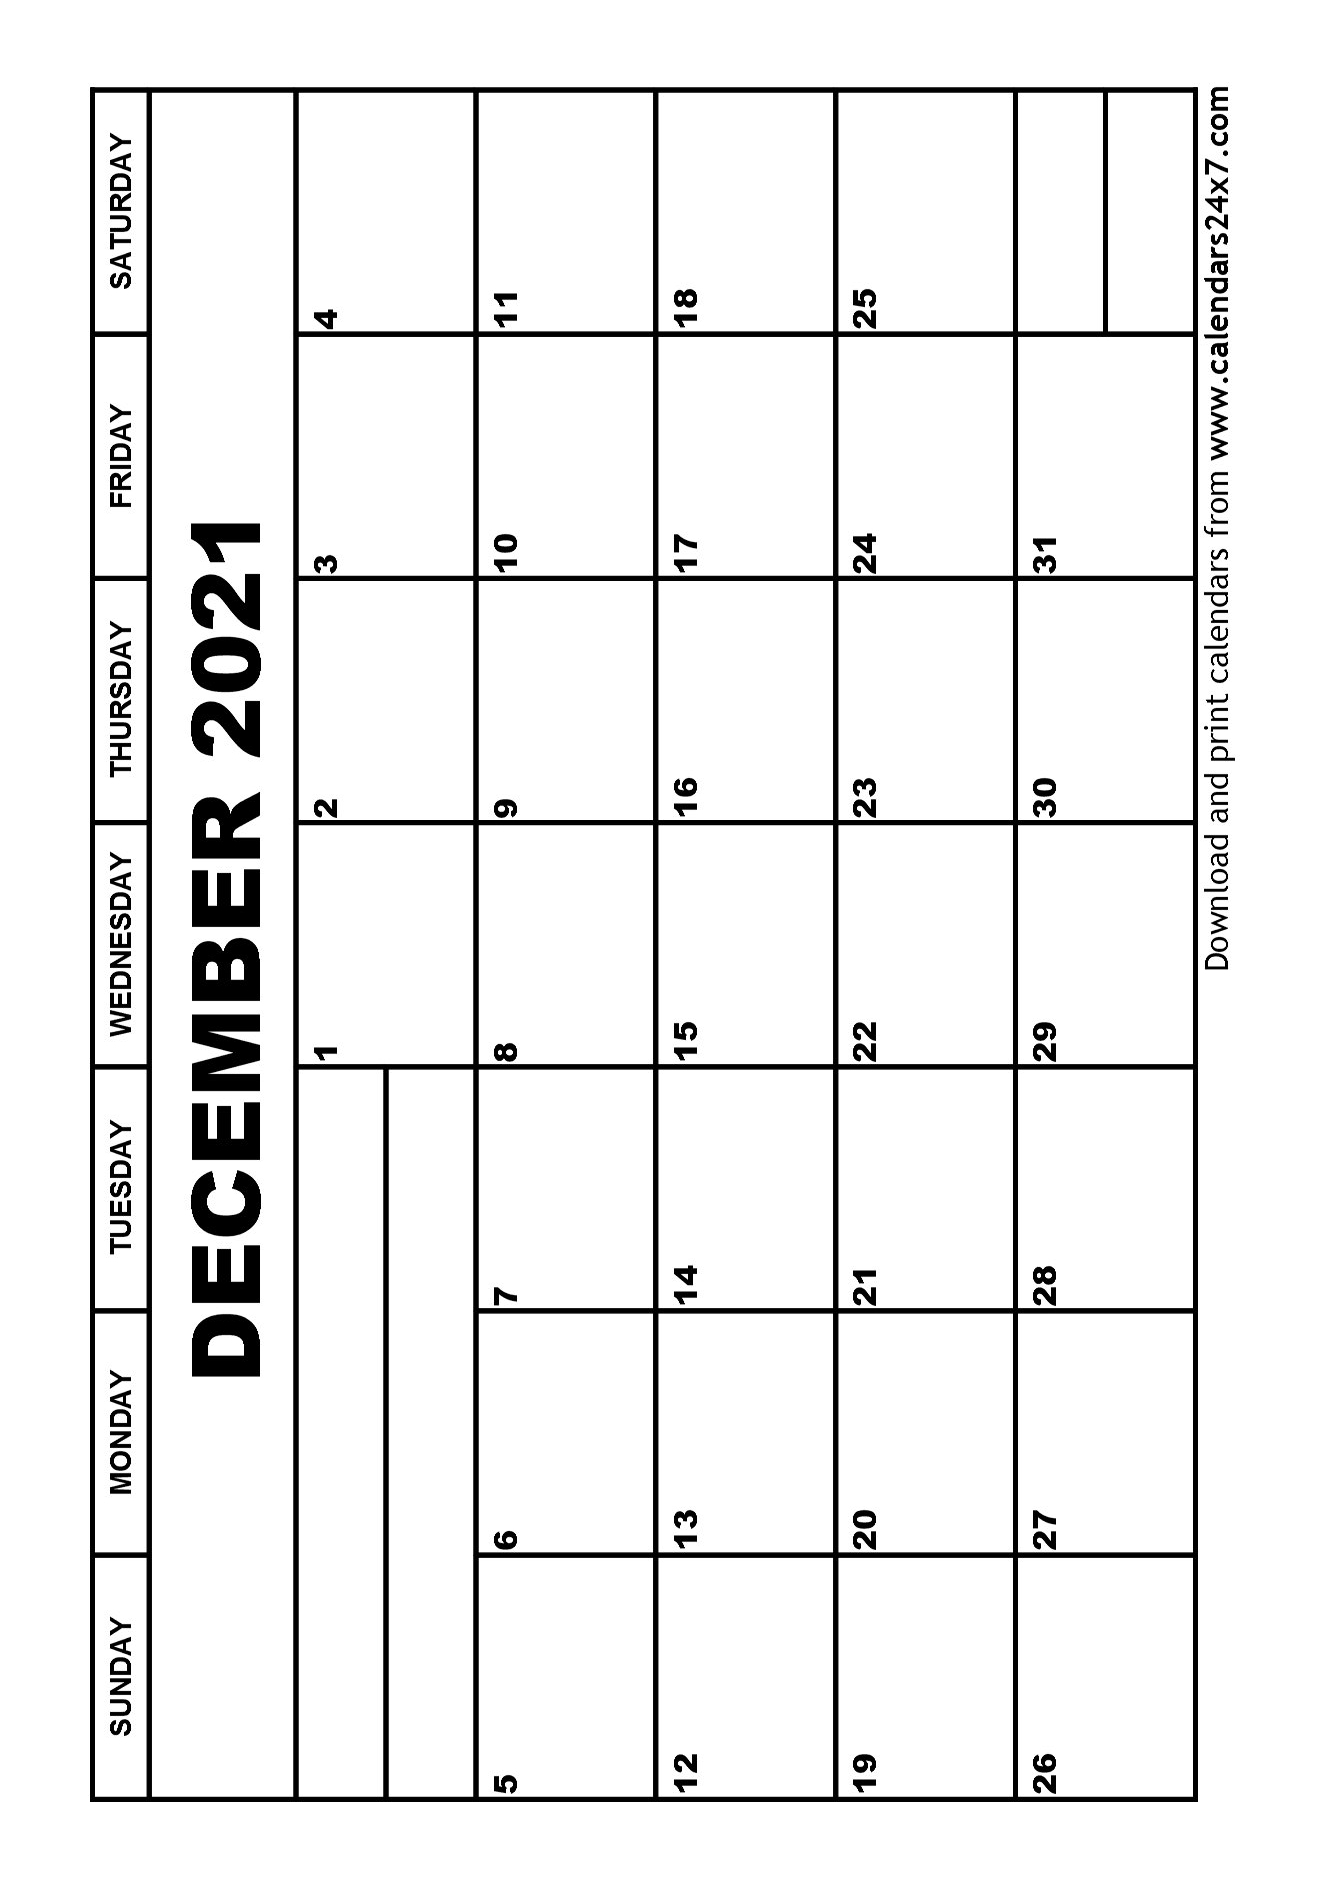 December 2021 Calendar & January 2022 Calendar Pertaining To December January Calendars 2022 2022